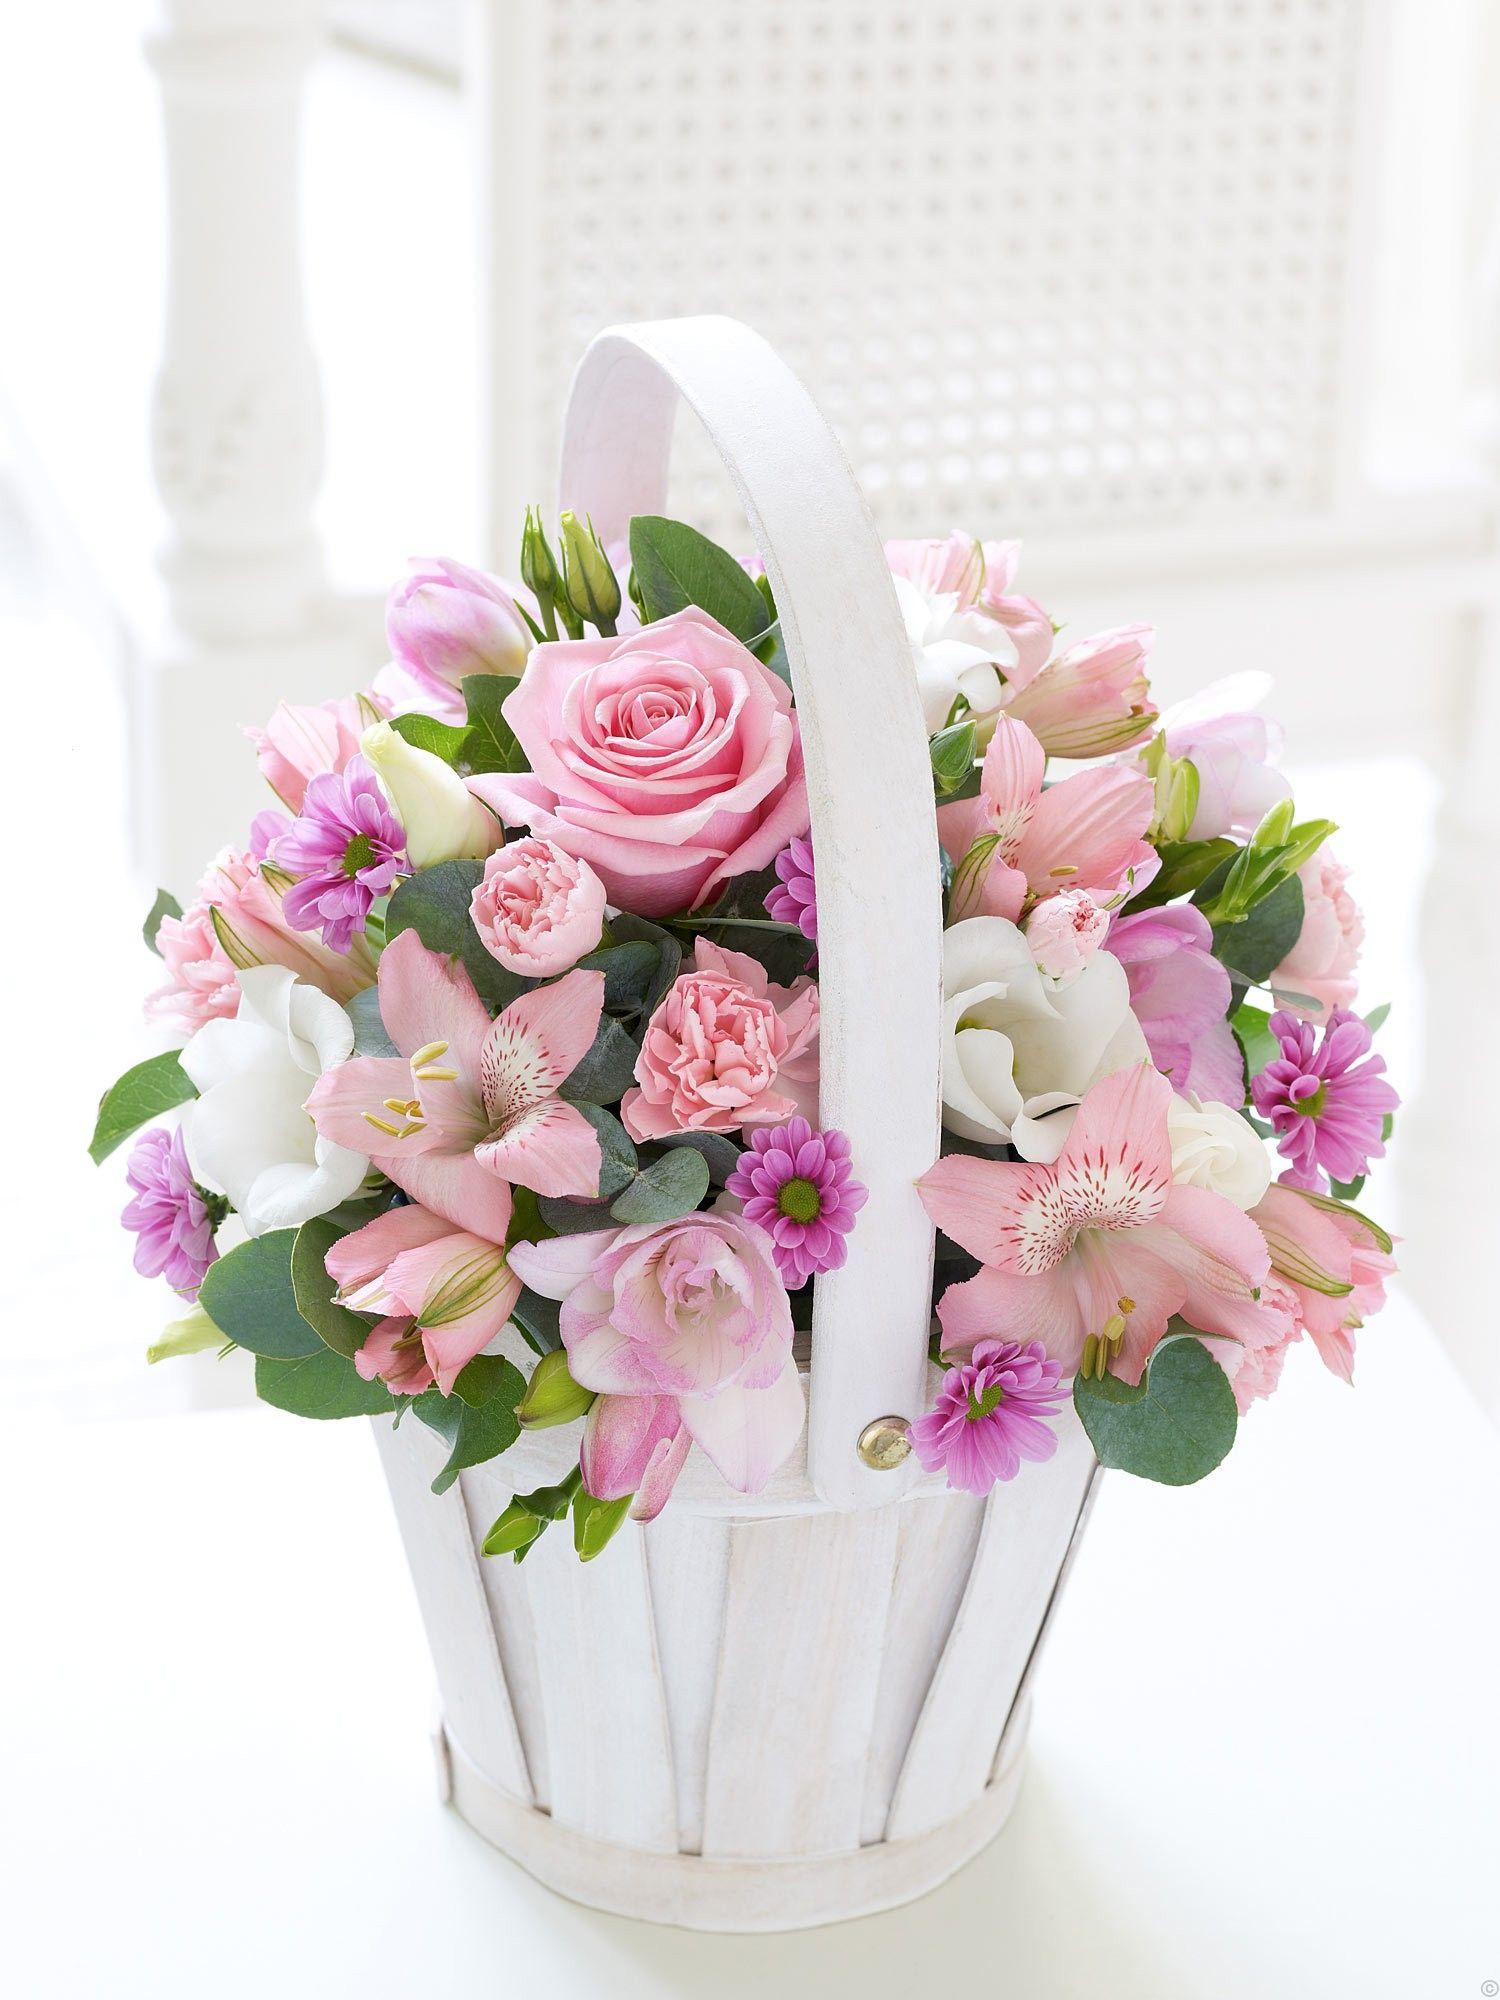 Pin by ania misiak on kwiaty pinterest beautiful flowers and flowers flowers izmirmasajfo